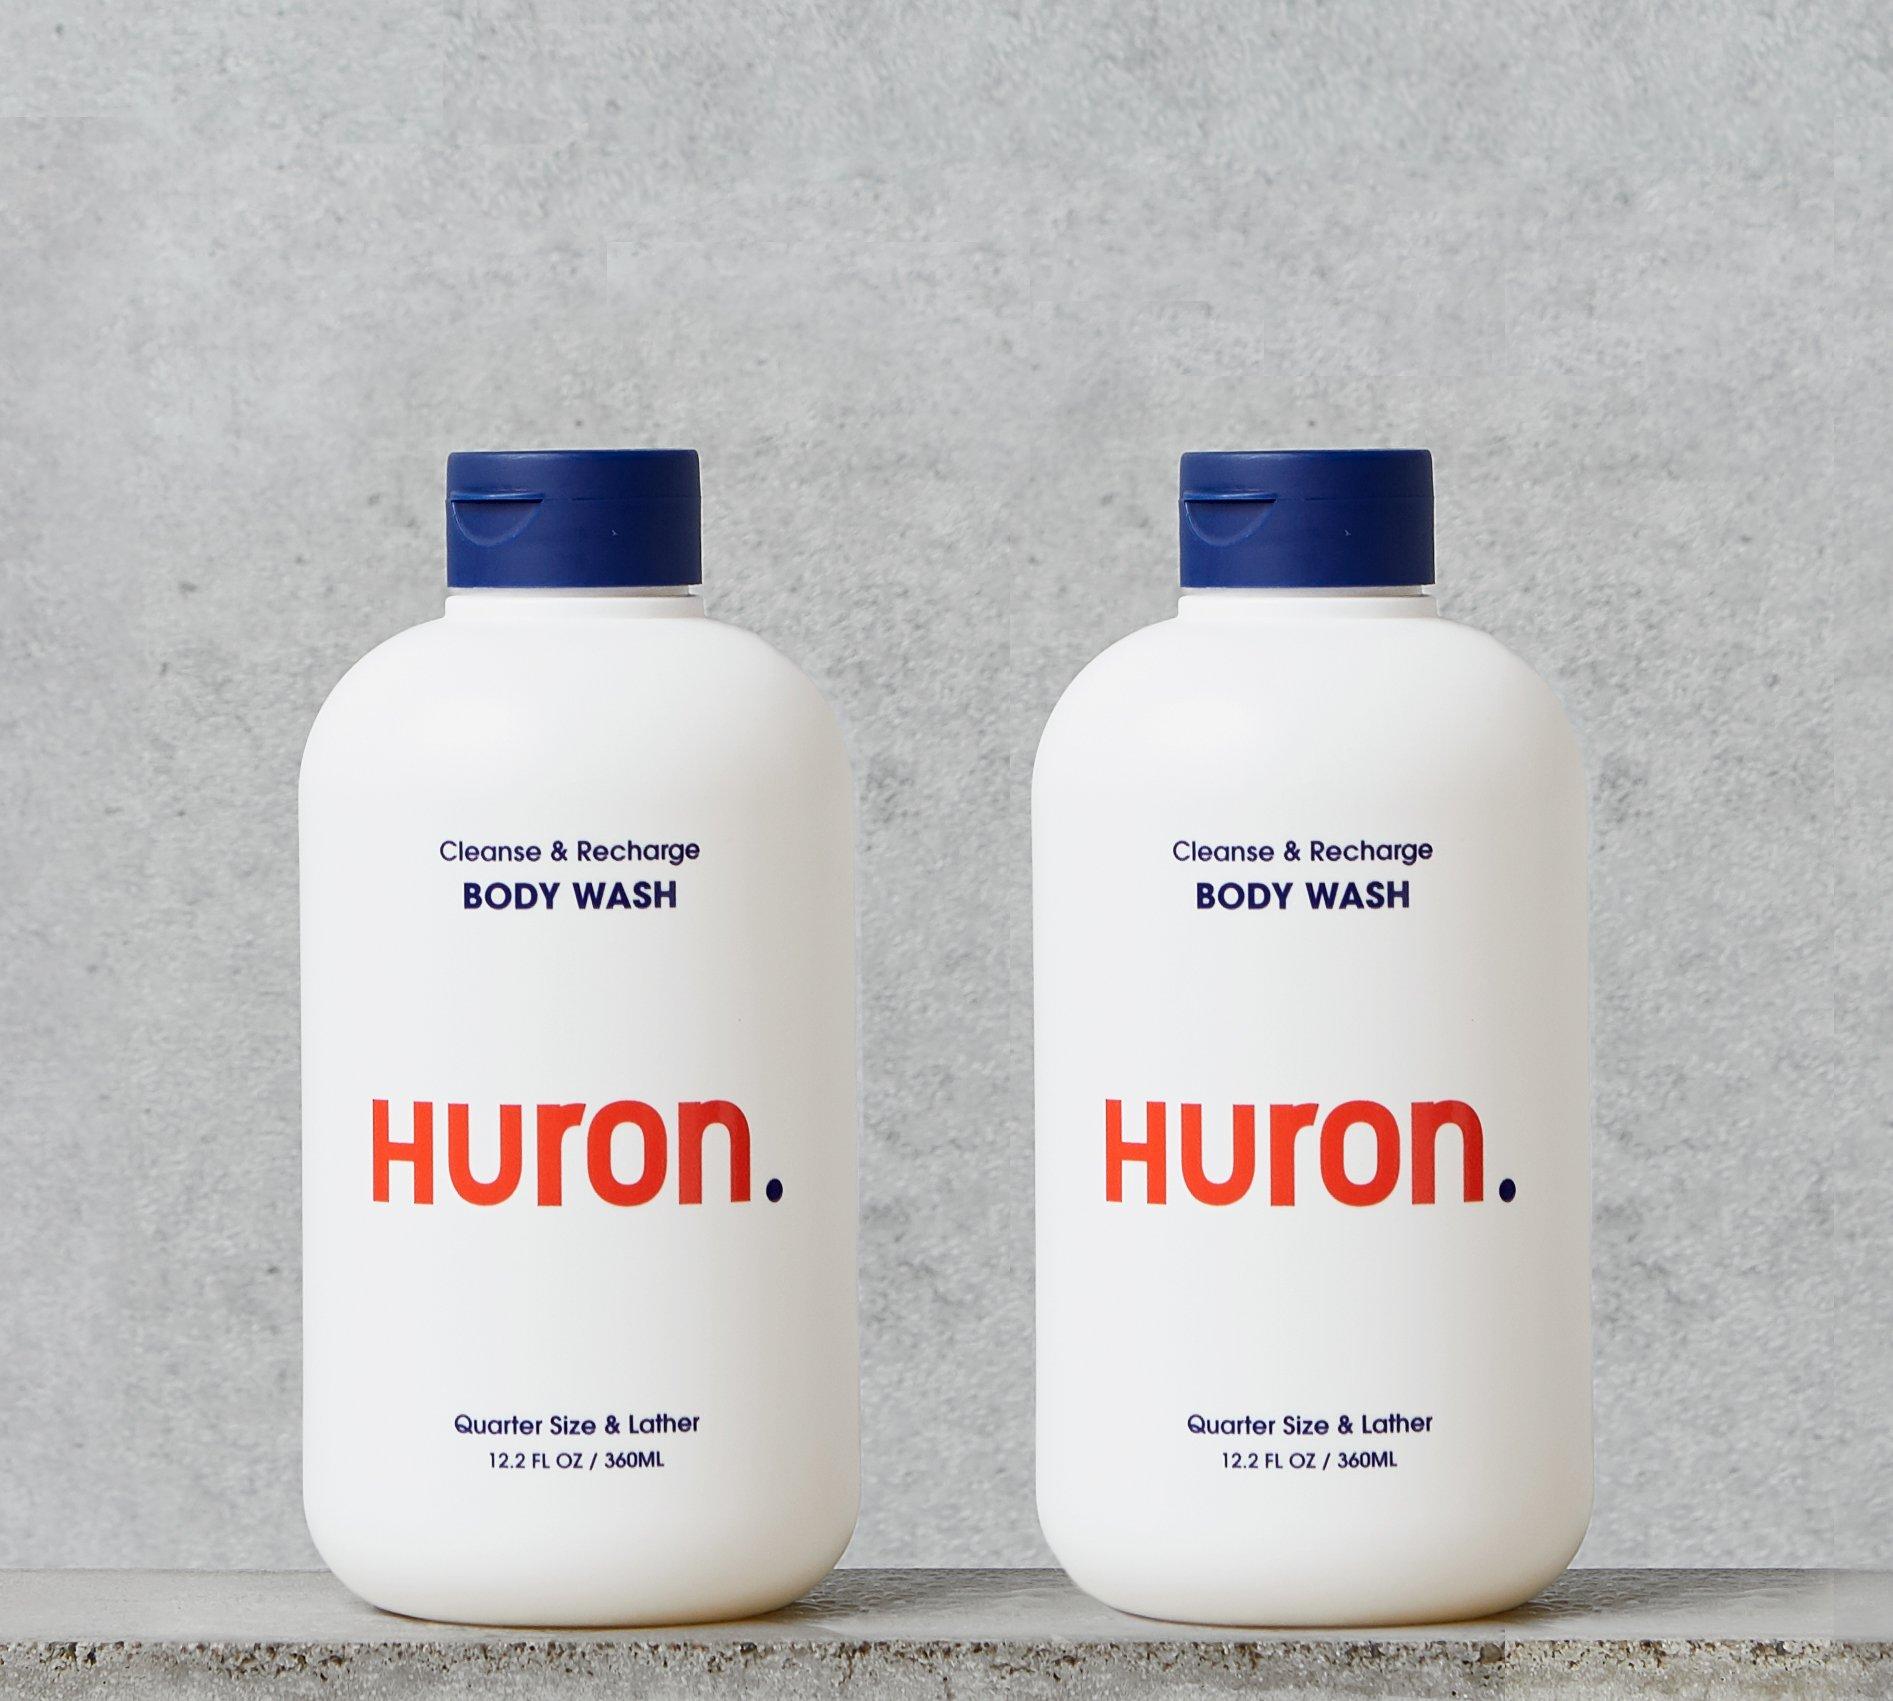 Amazon 2-Pack Body Wash